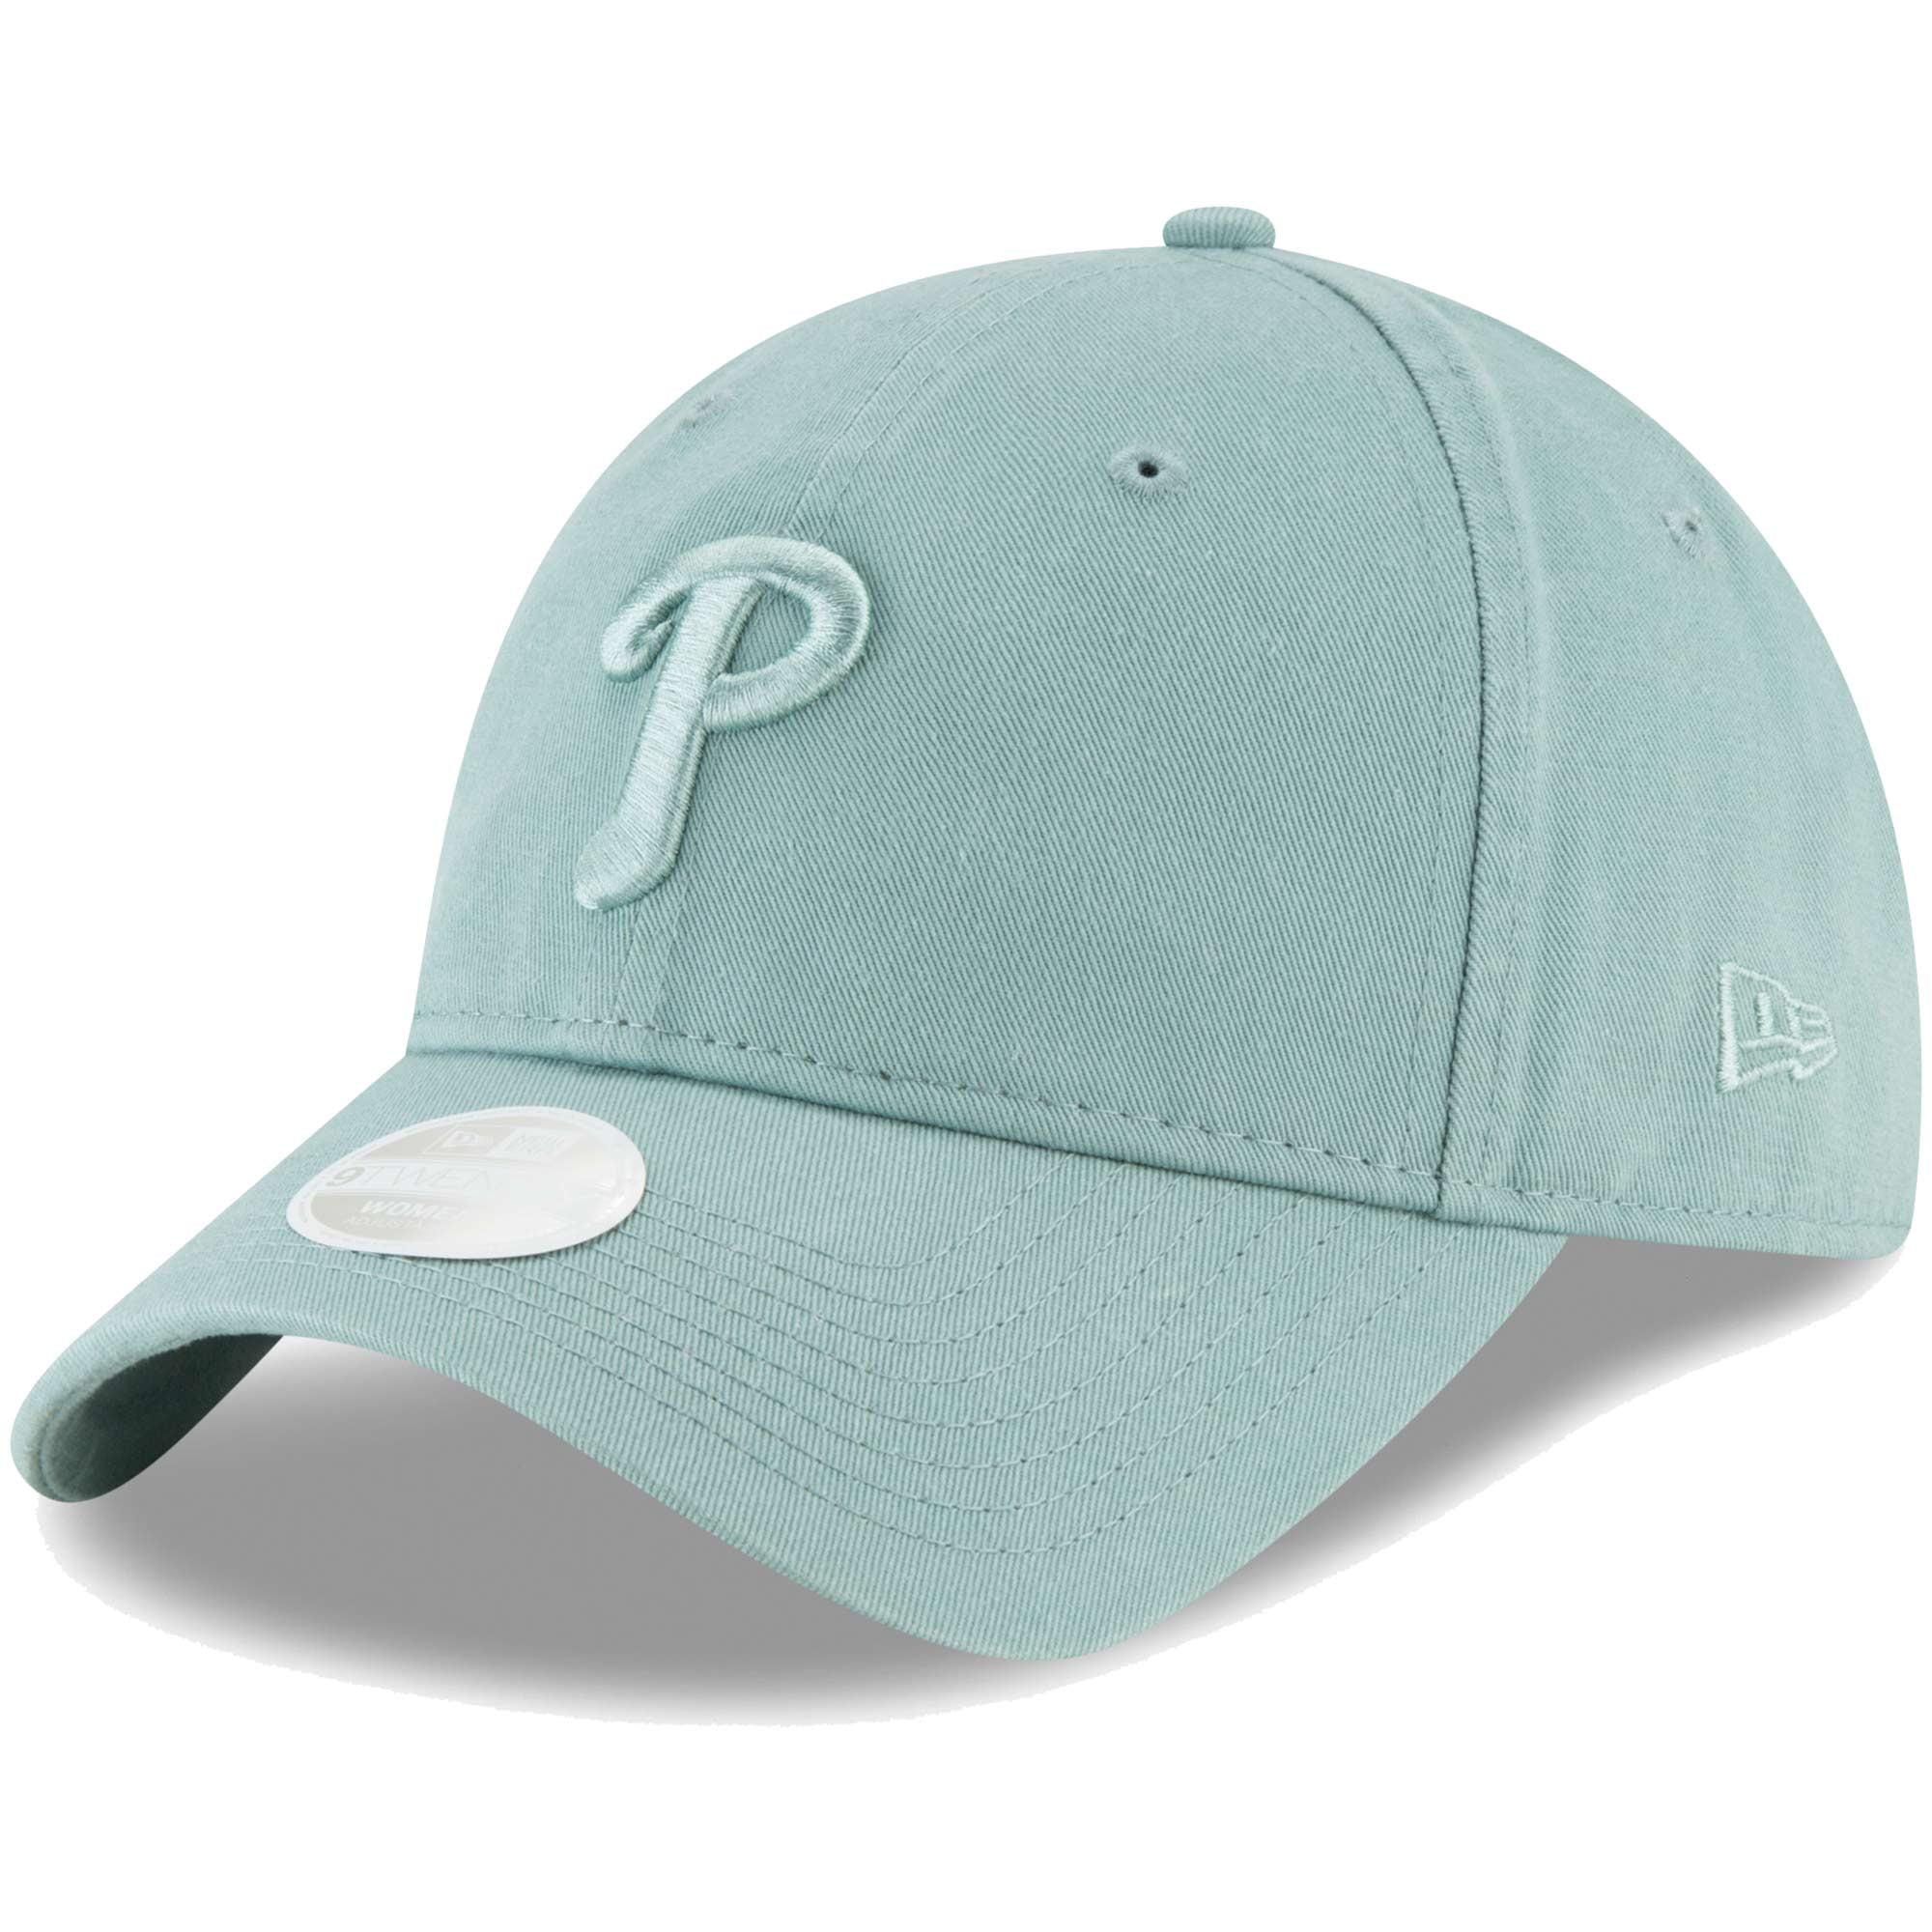 Philadelphia Phillies New Era Women's Core Classic Twill 9TWENTY Adjustable Hat - Light Blue - OSFA